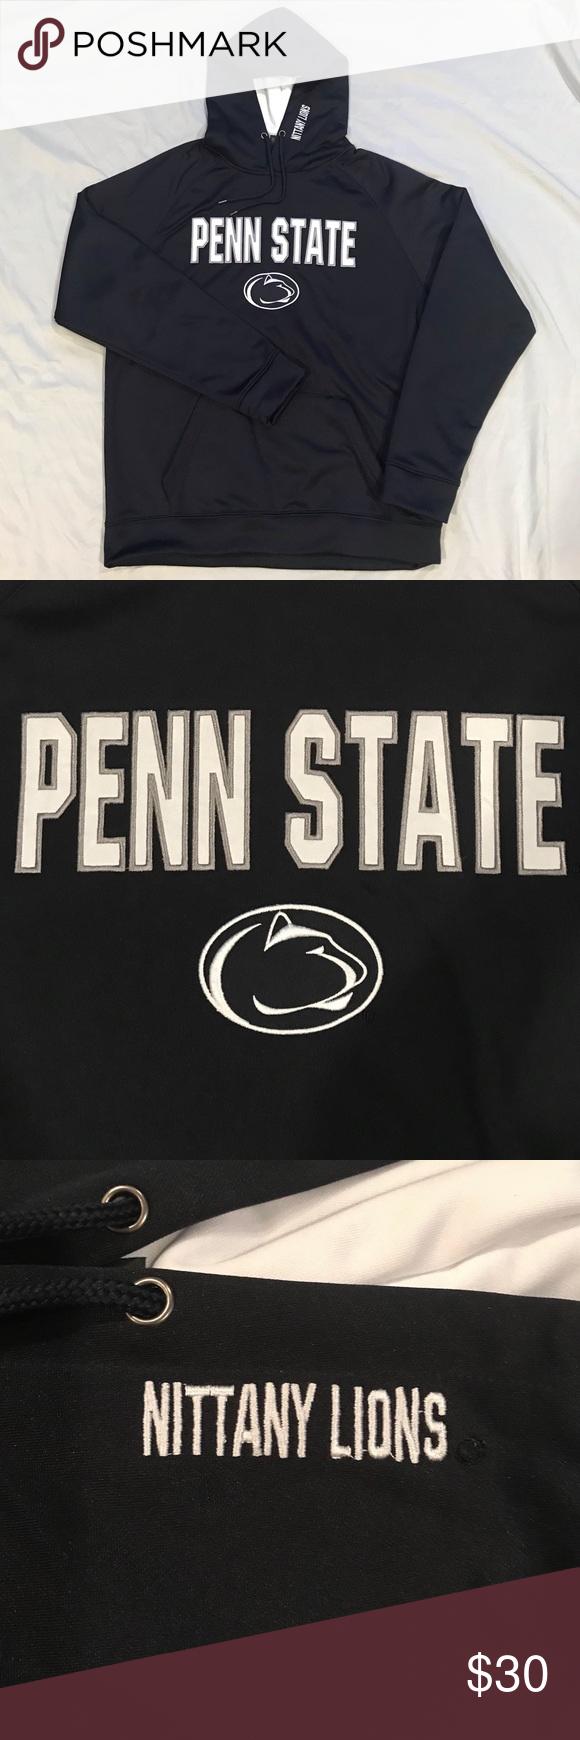 Penn State Hooded Sweatshirt Colosseum Size Large Hooded Sweatshirts Sweatshirts Sweatshirt Shirt [ 1740 x 580 Pixel ]